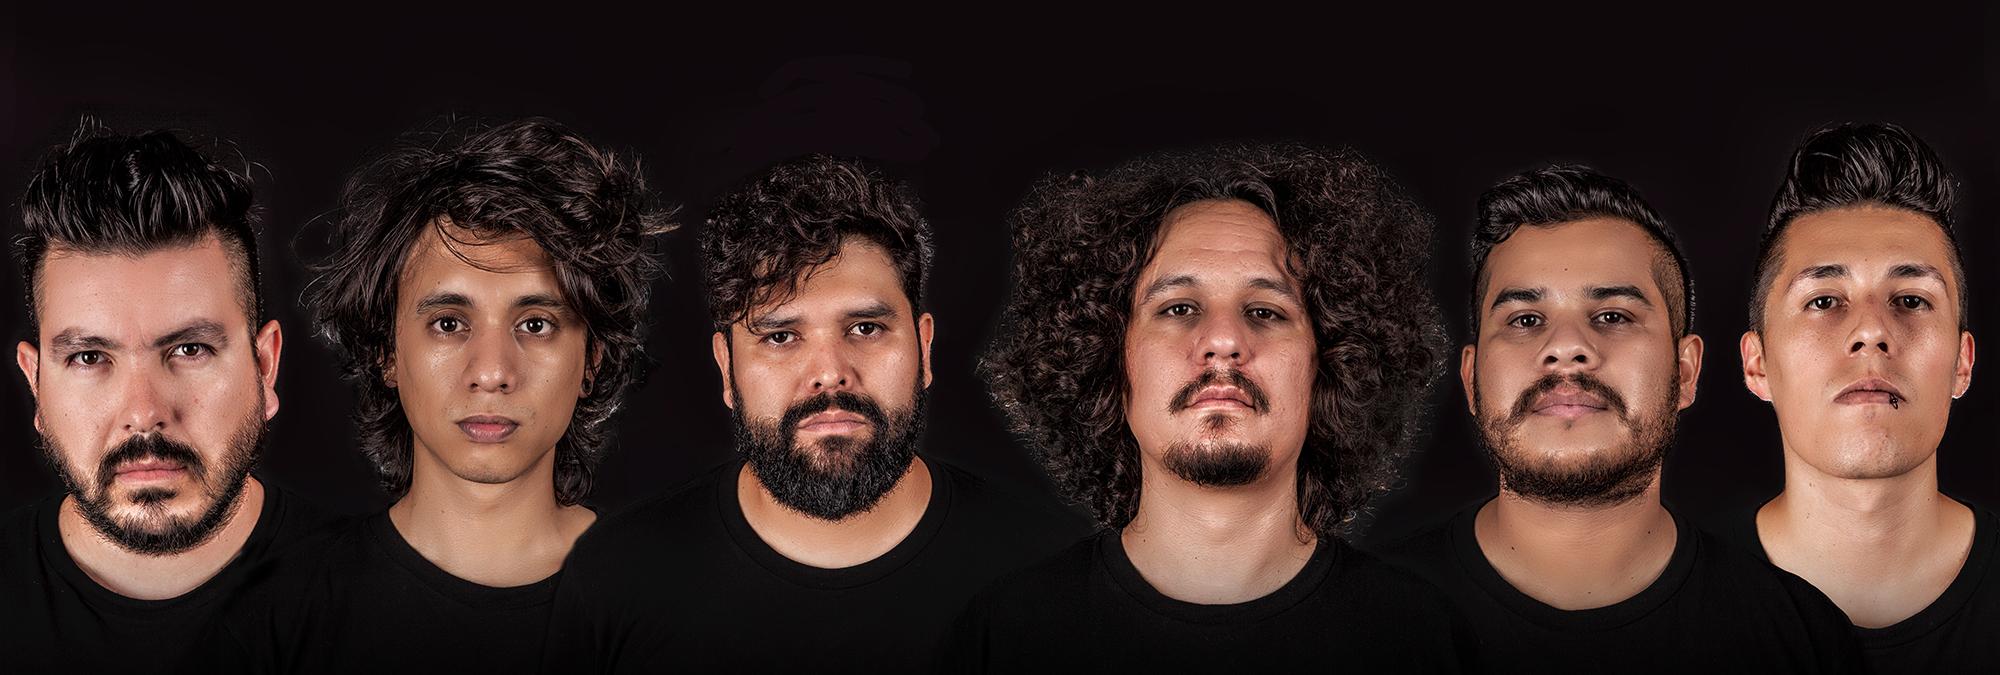 troker-heads-photocredit-calavera-estudio